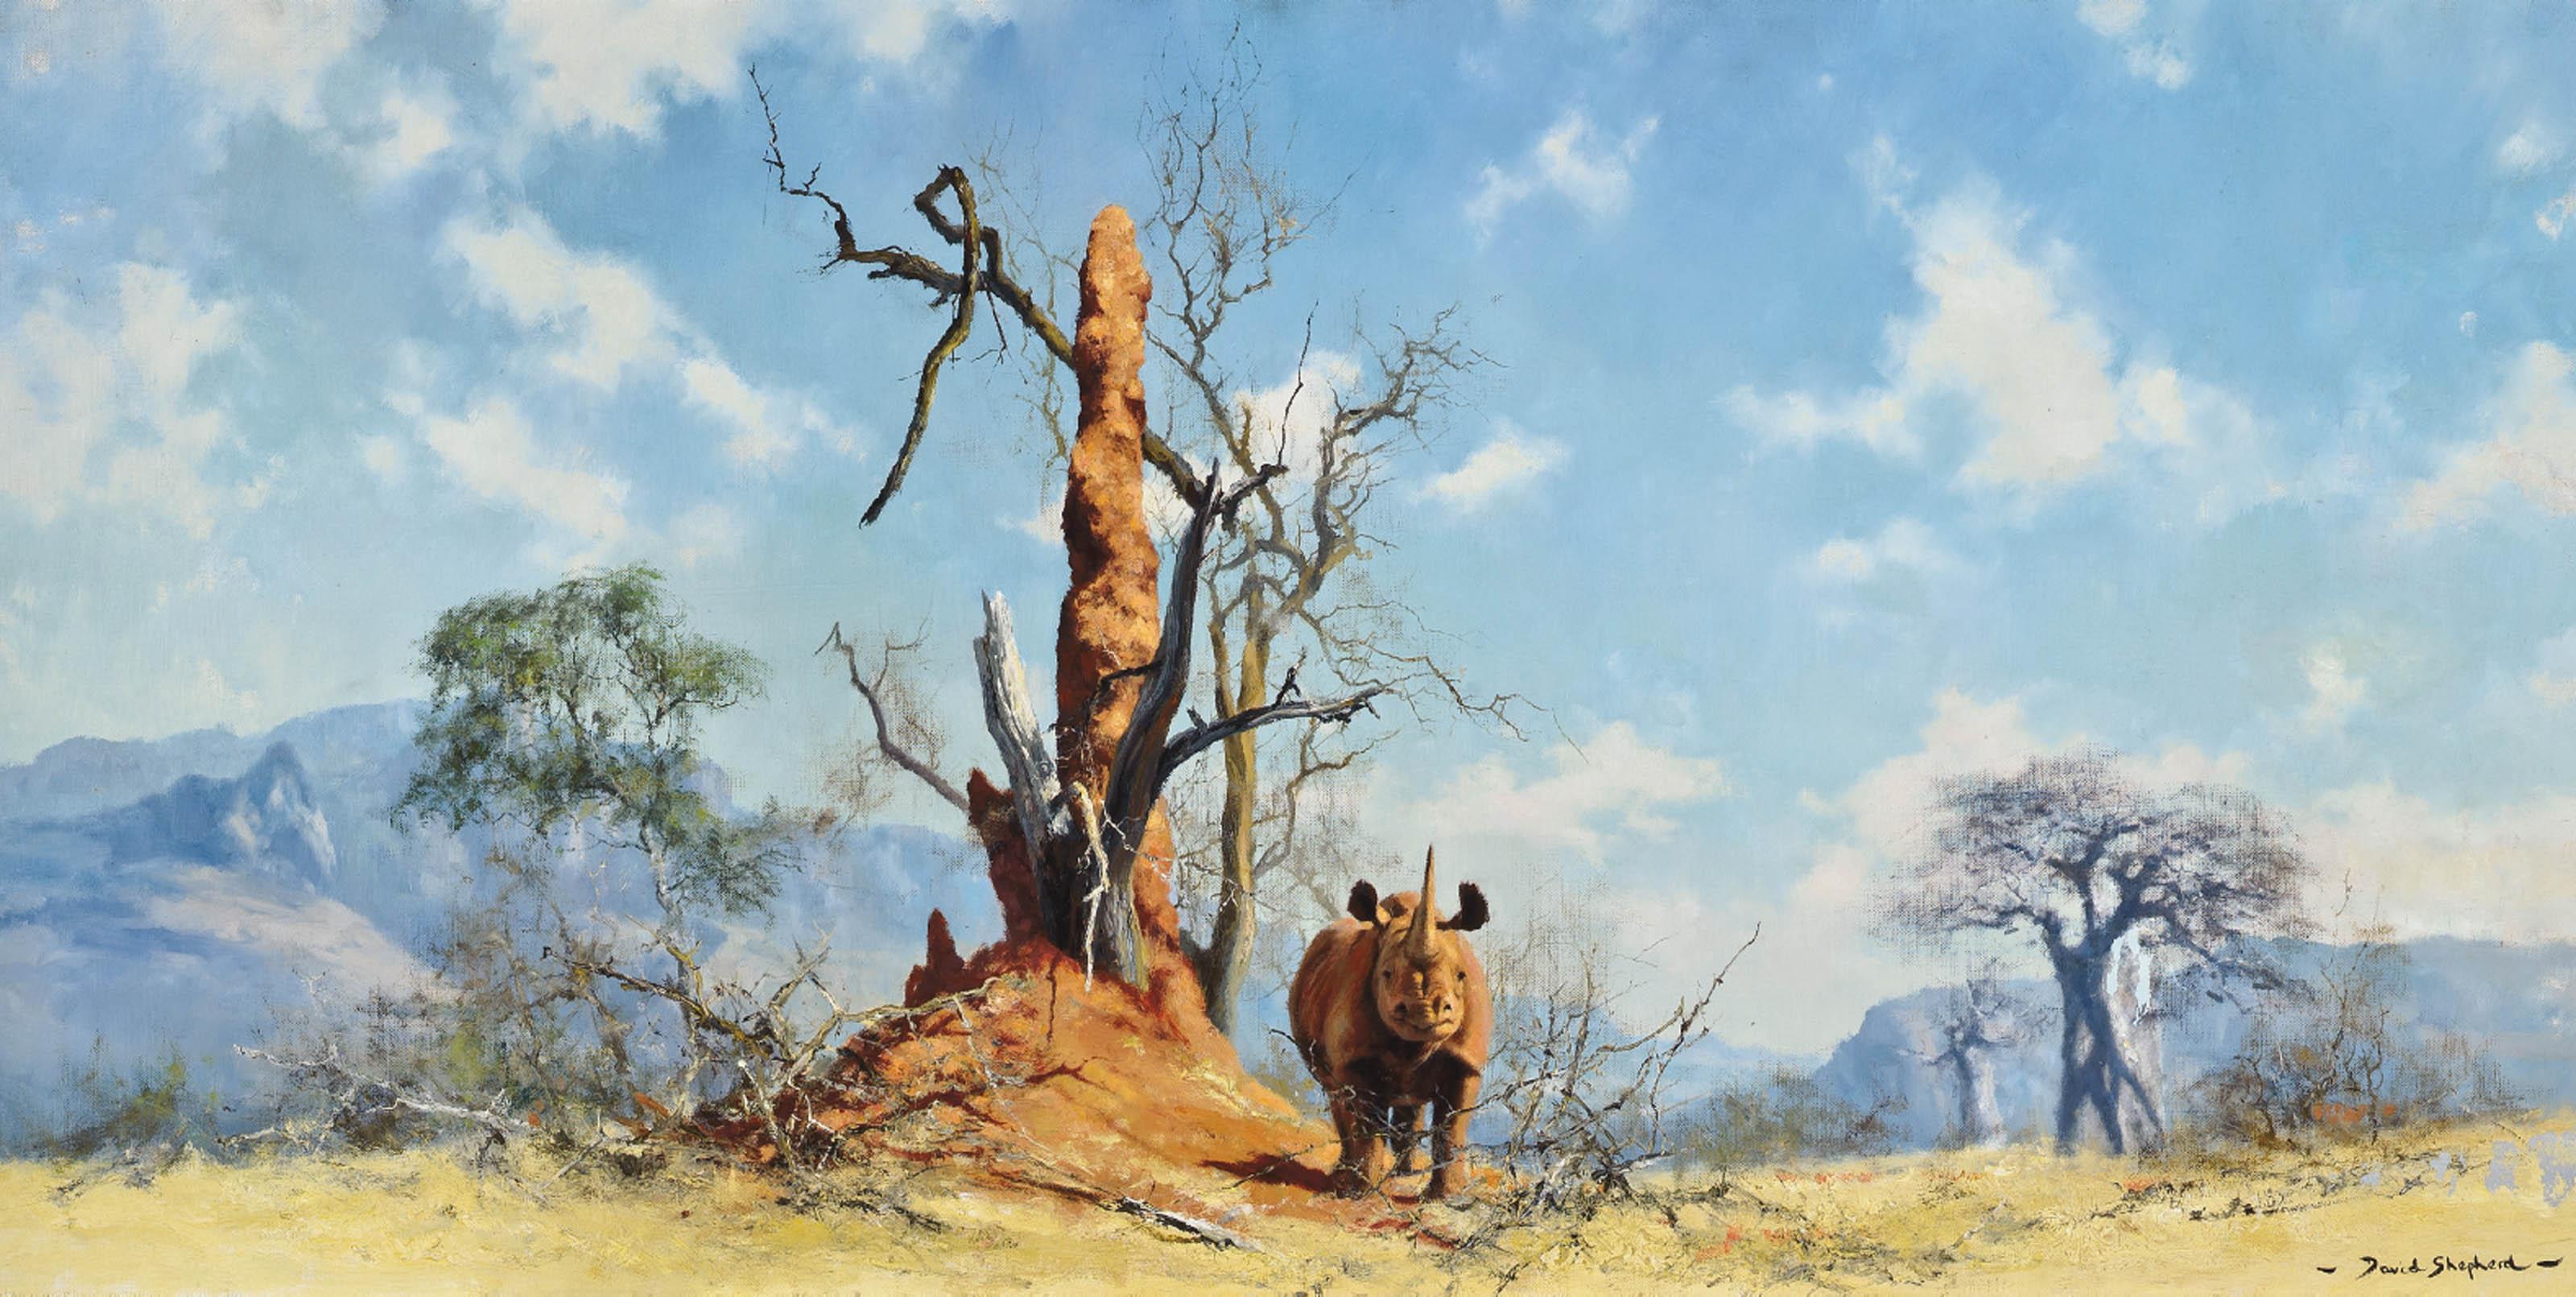 Rhino country